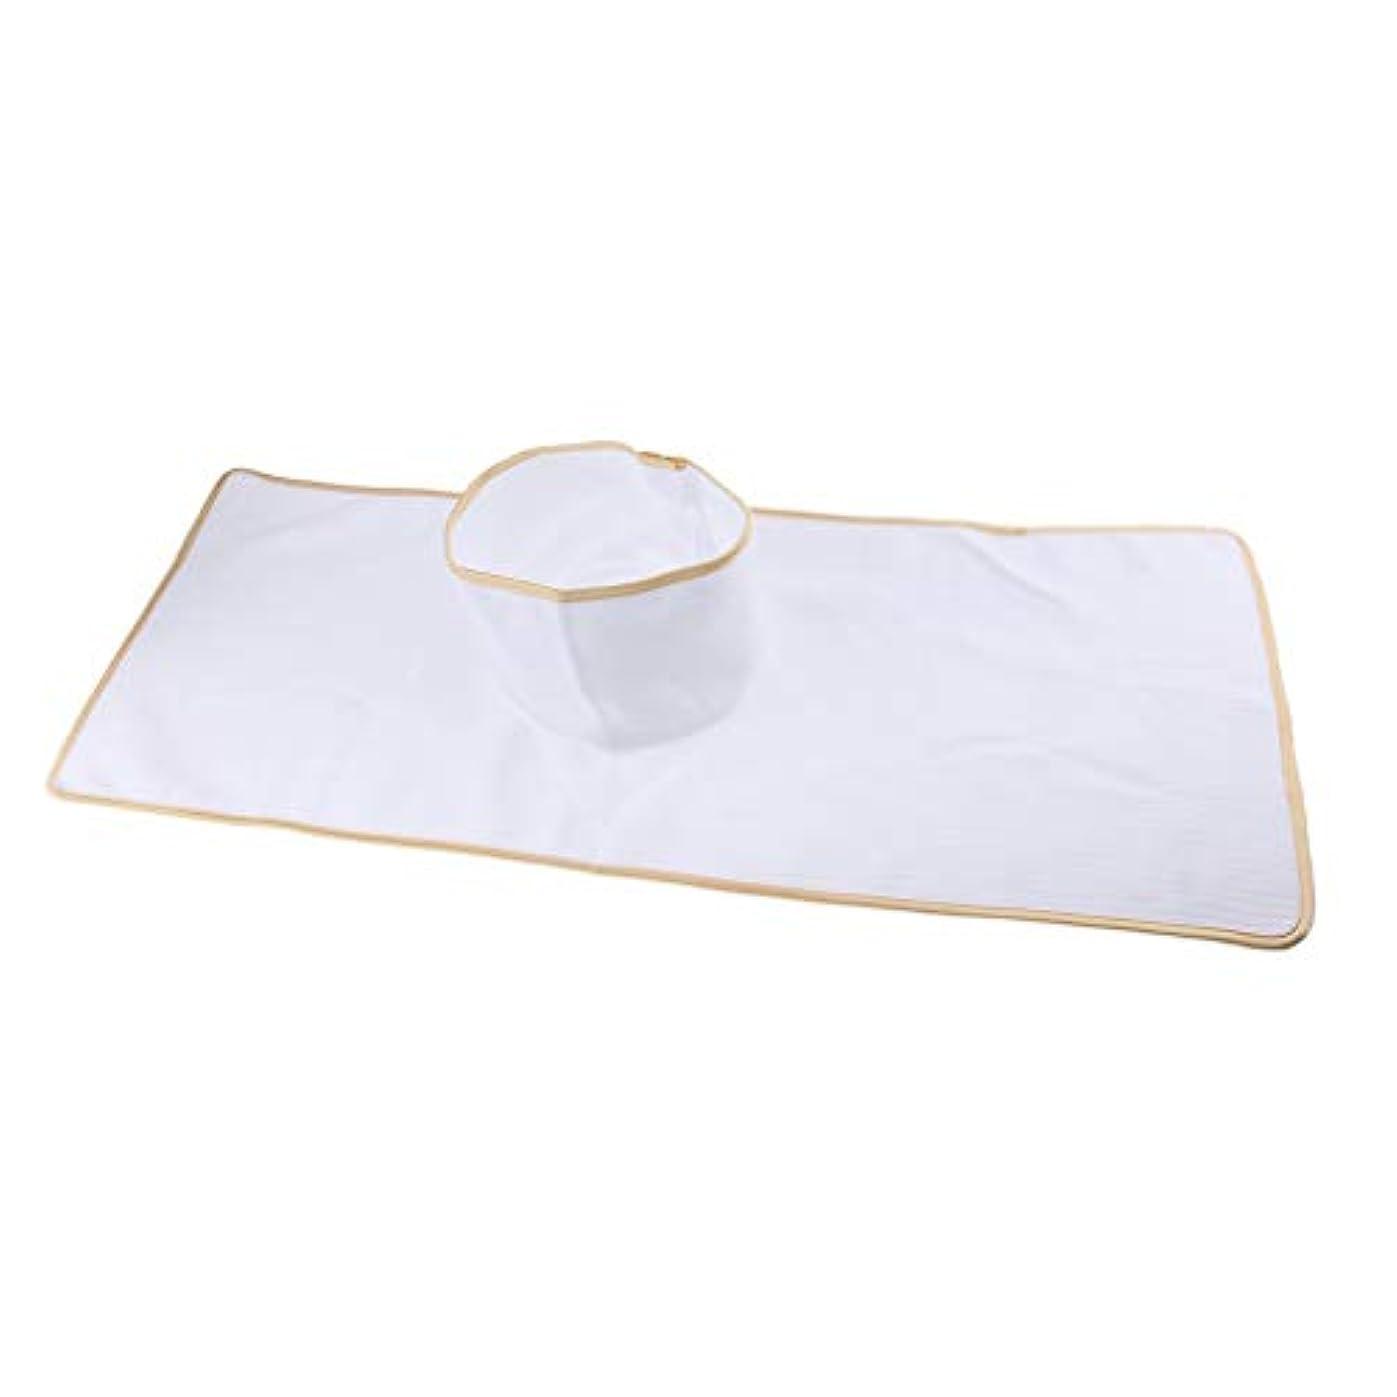 Baoblaze マッサージテーブルカバー シート パッド 顔の穴付き 再使用可能 約90×35cm 全3色 - 白